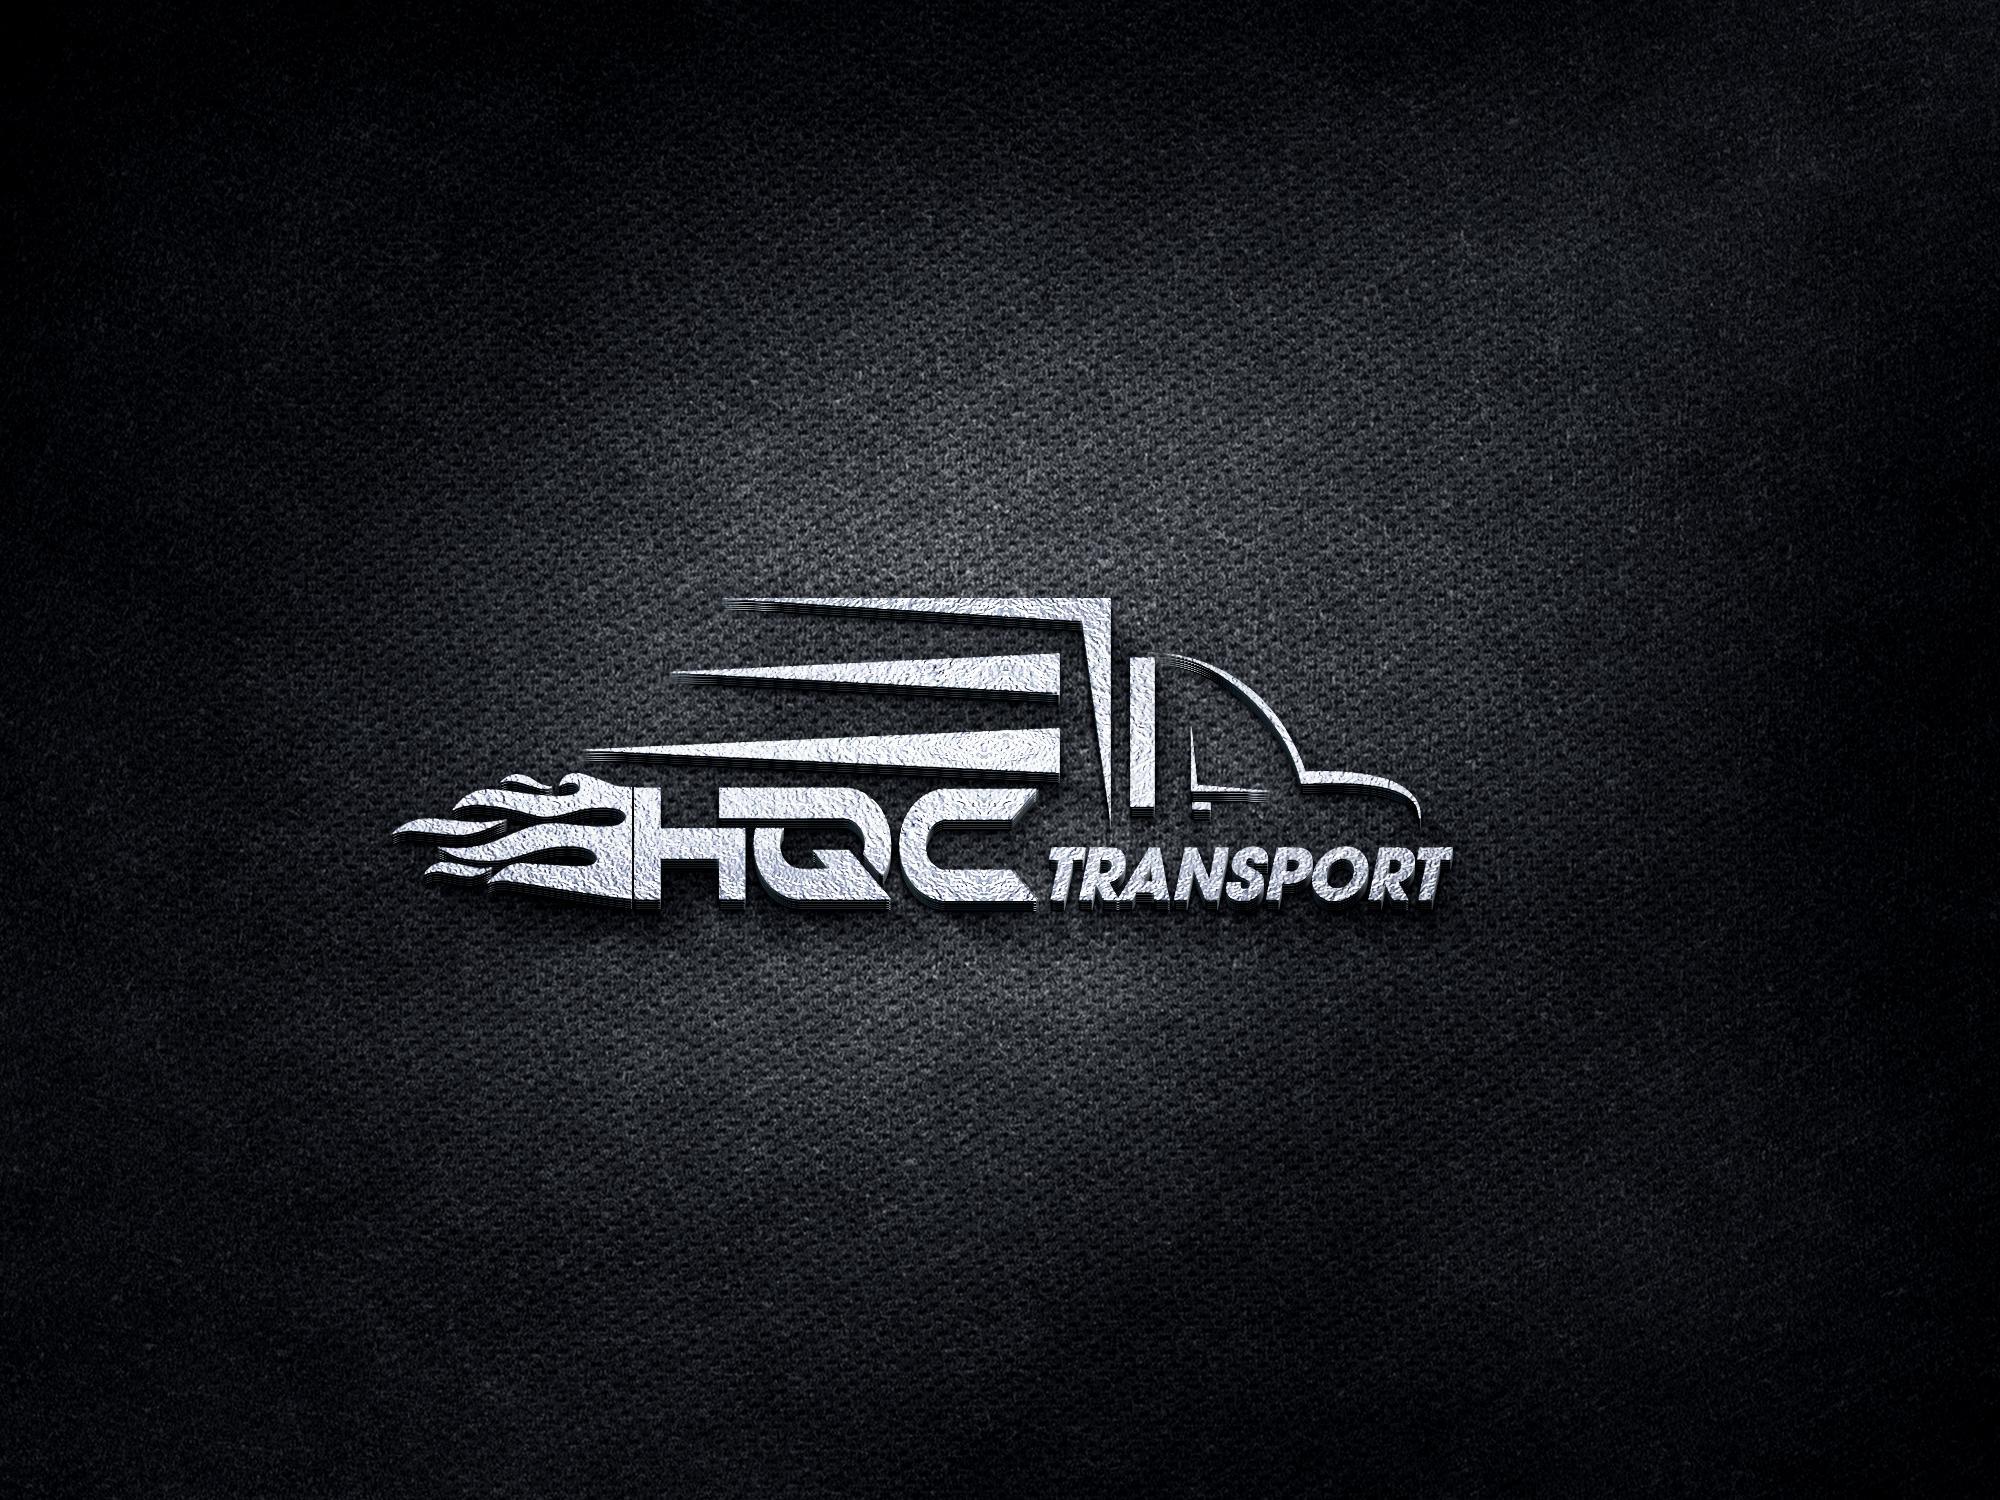 logo hqc